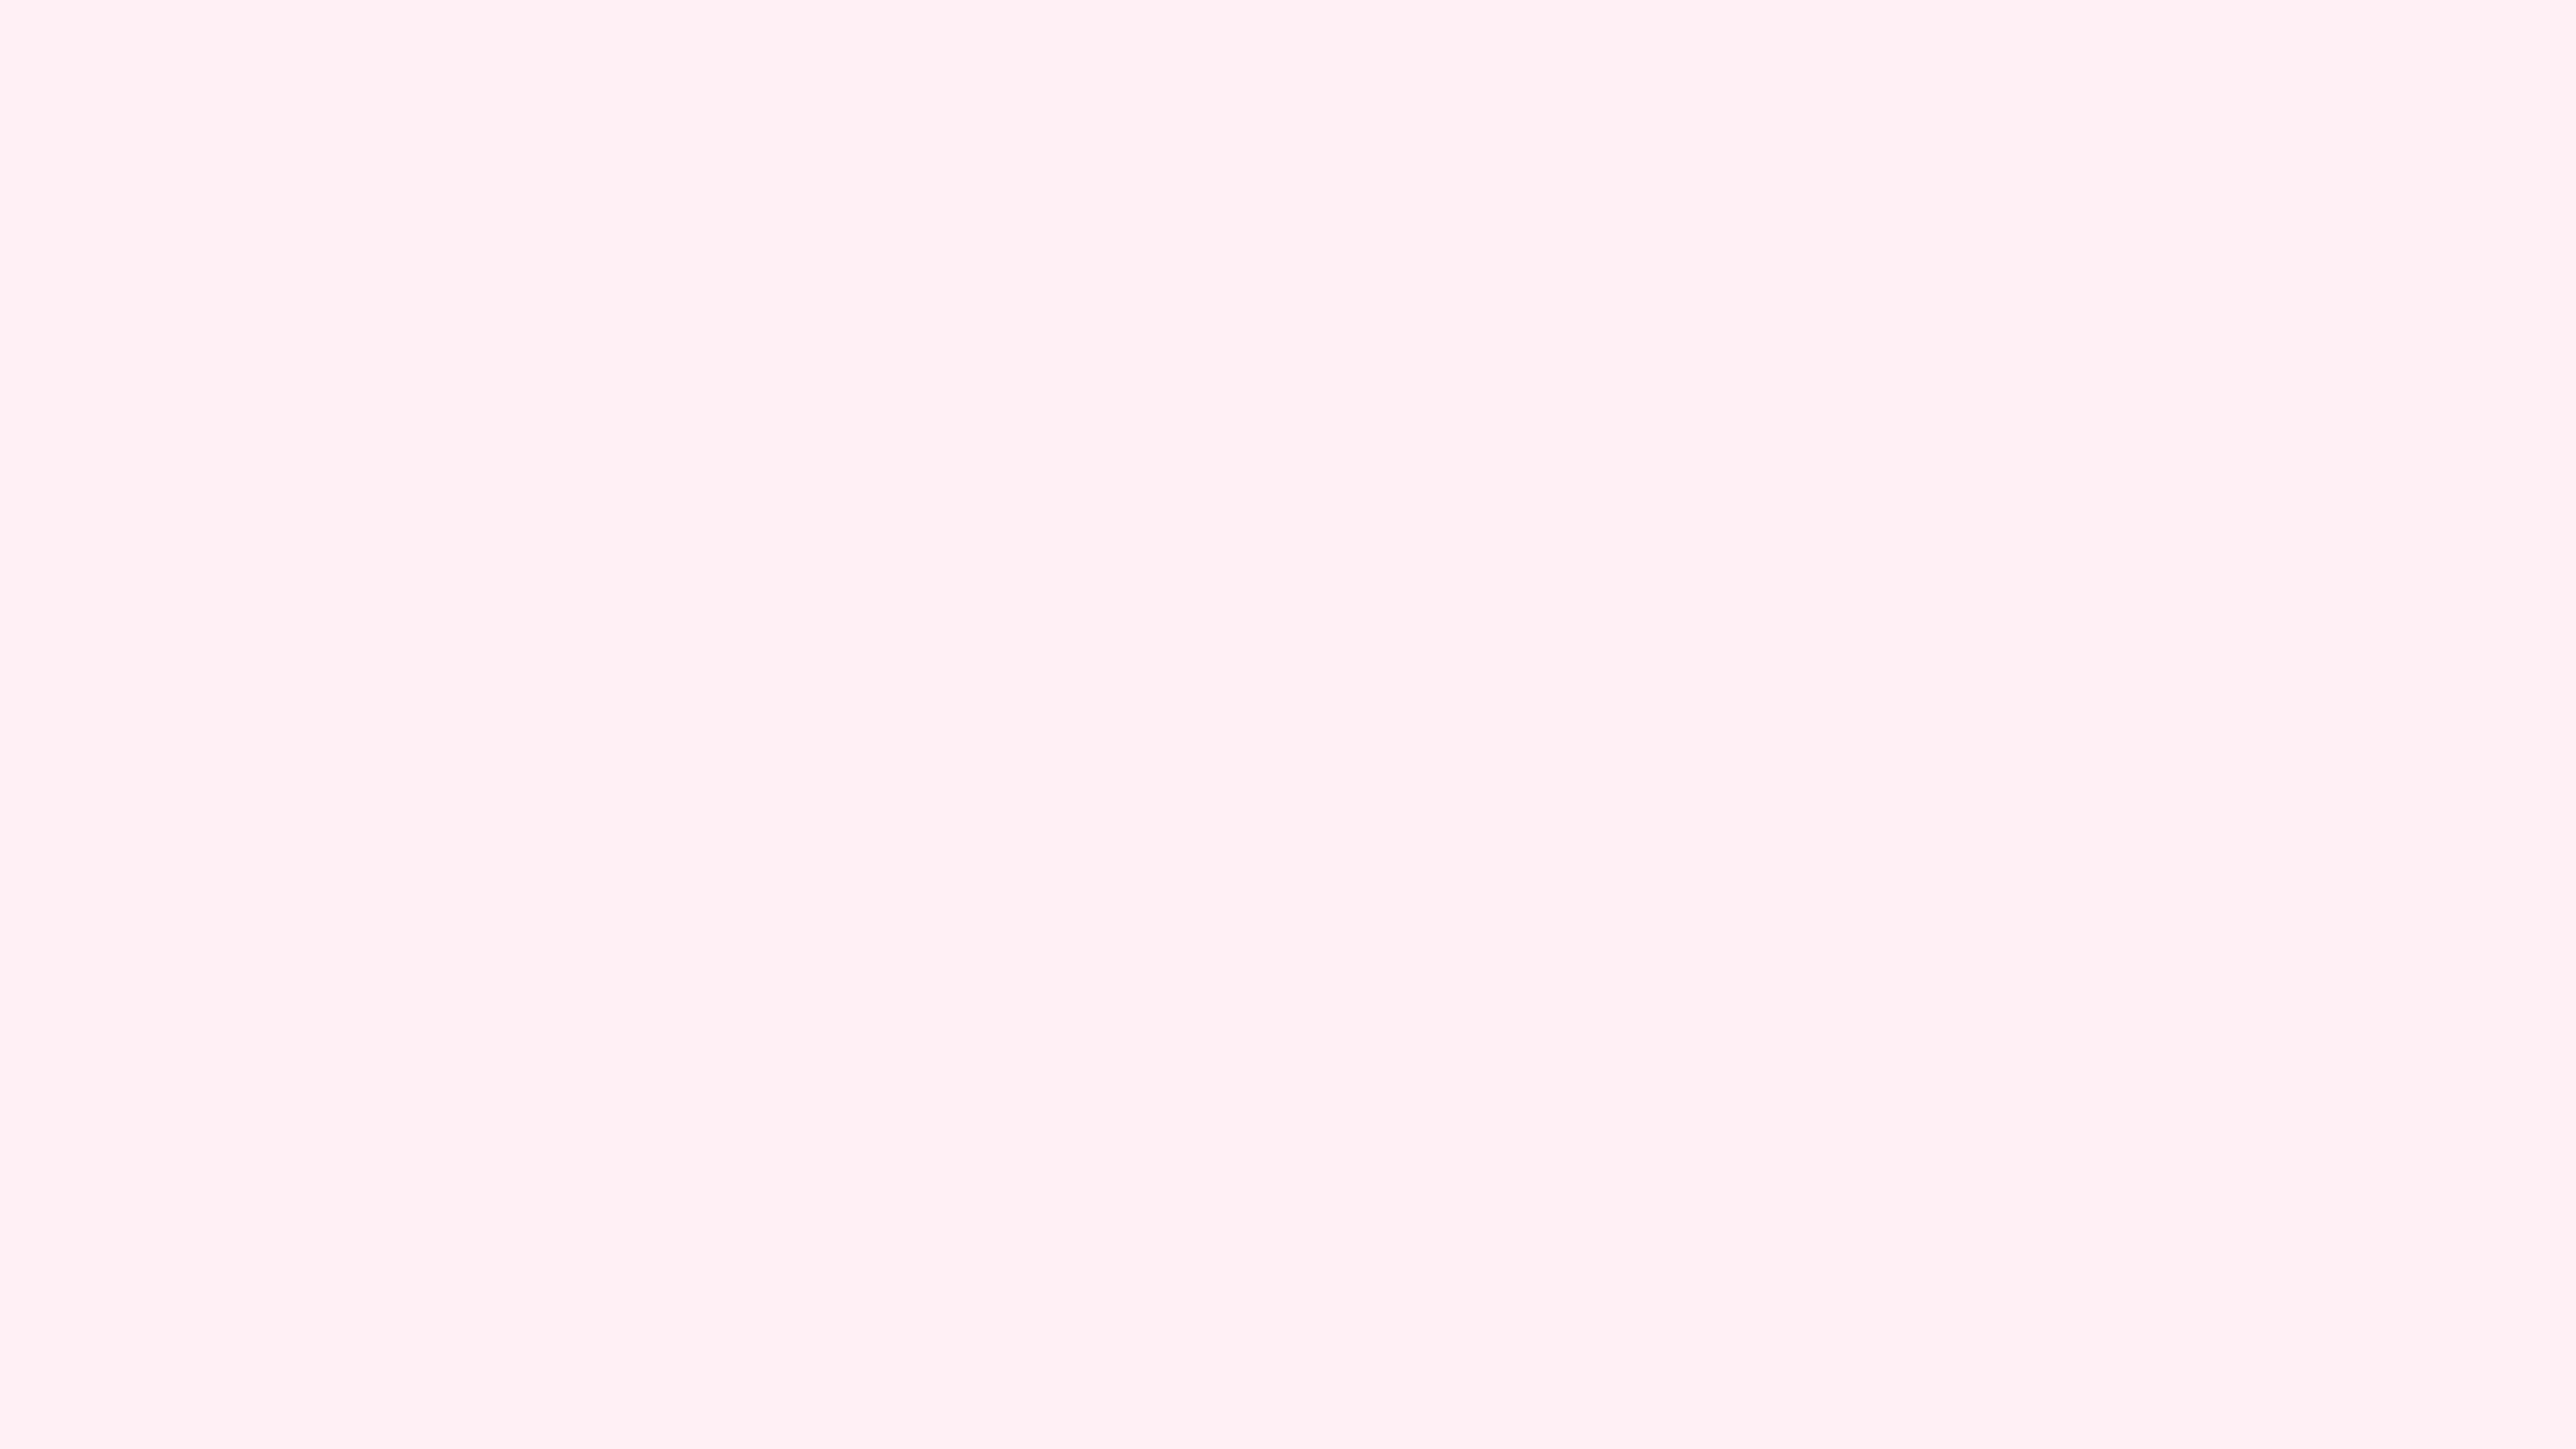 7680x4320 Lavender Blush Solid Color Background